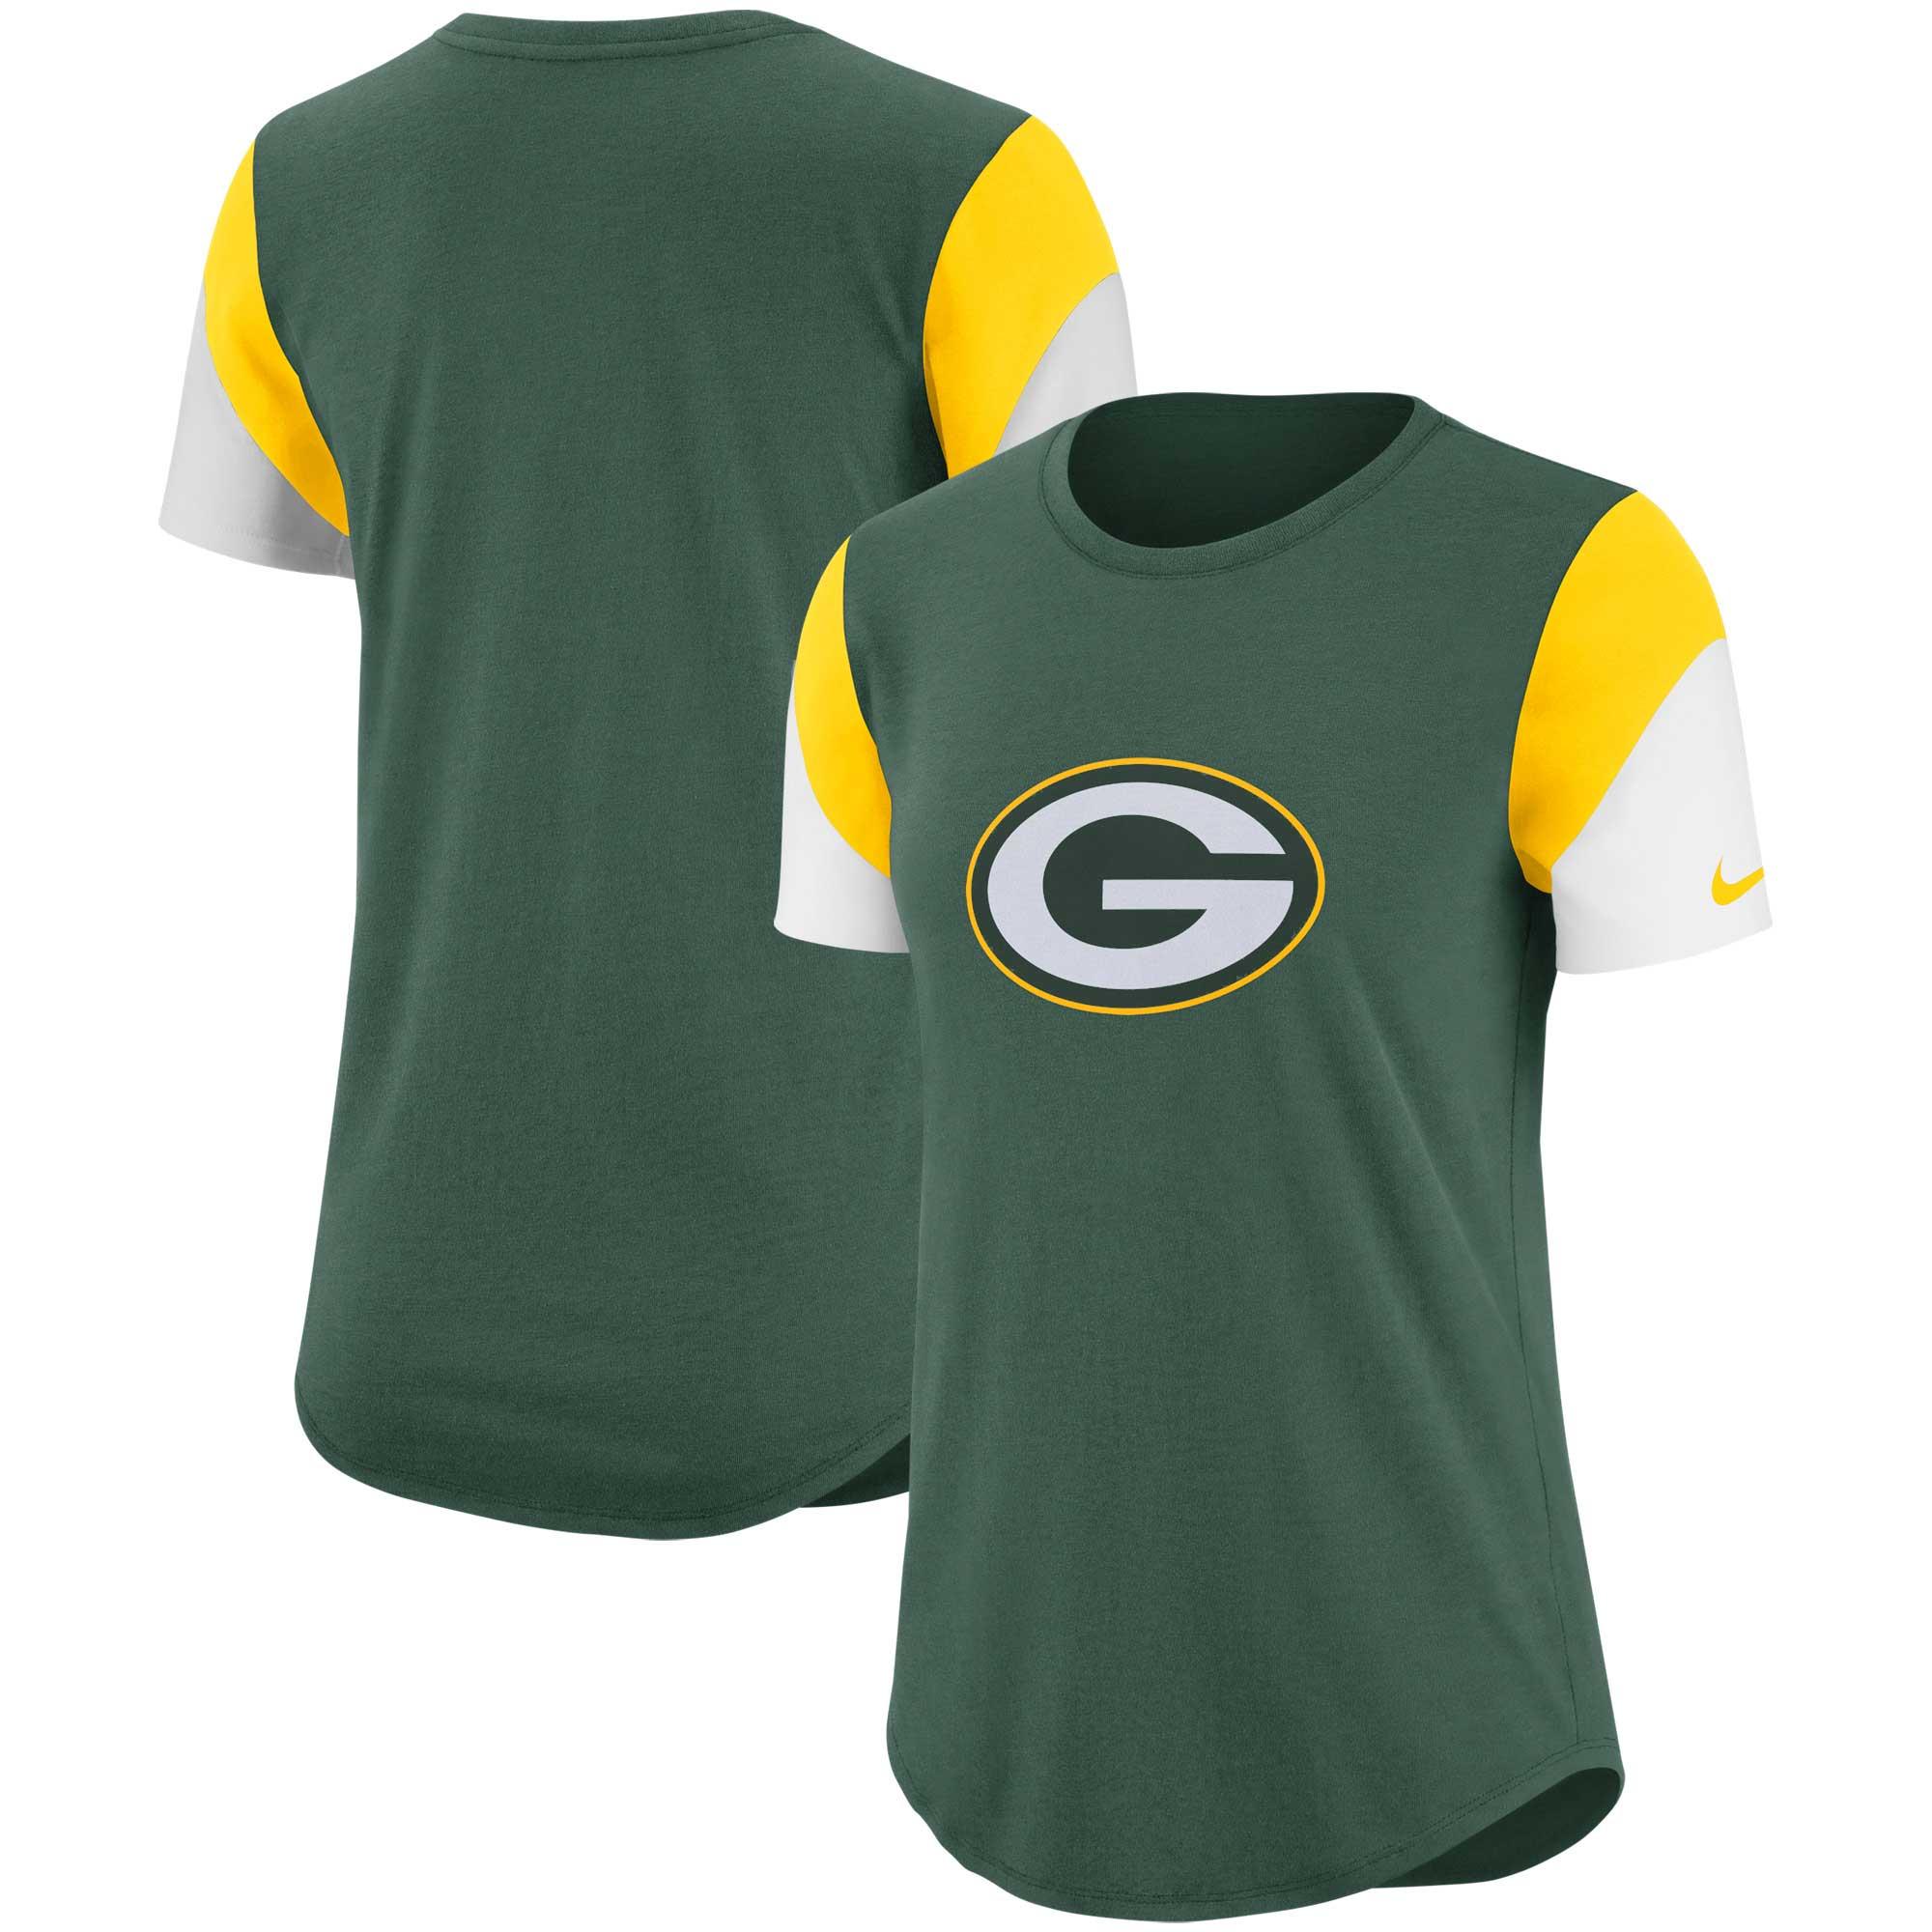 Green Bay Packers Nike Women's Tri-Blend Team Fan T-Shirt - Green/Gold